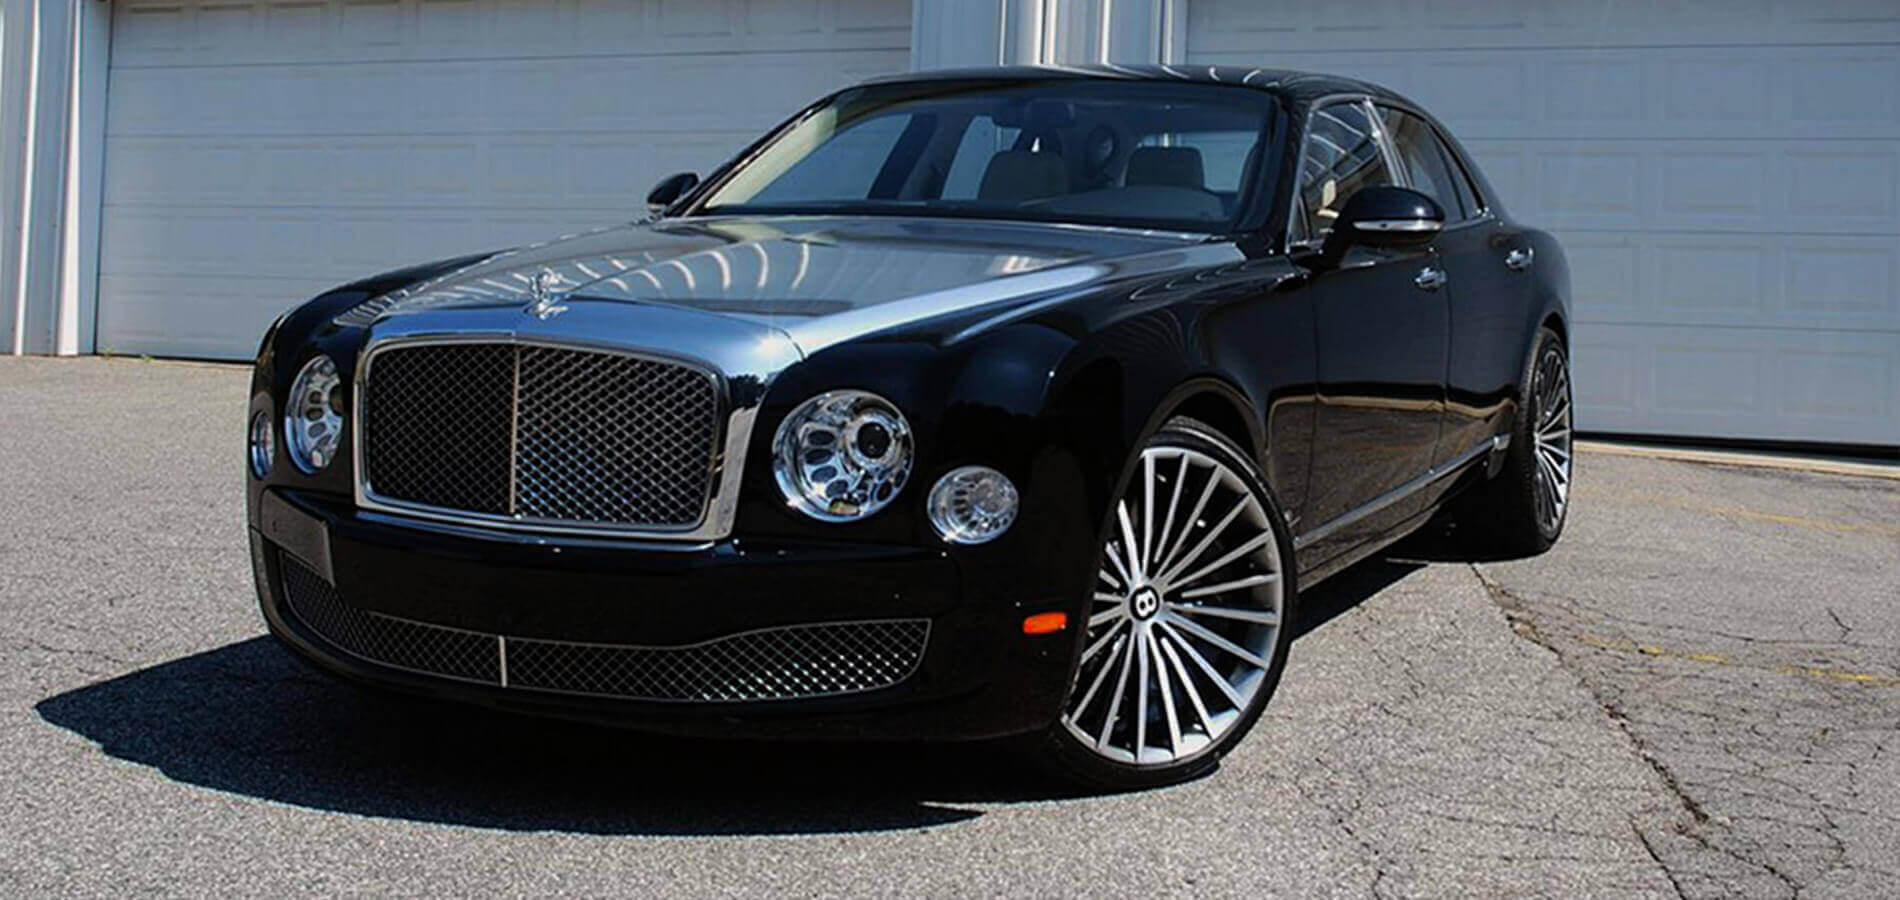 Bentley Mulsanne Chauffeur Hire London Llc